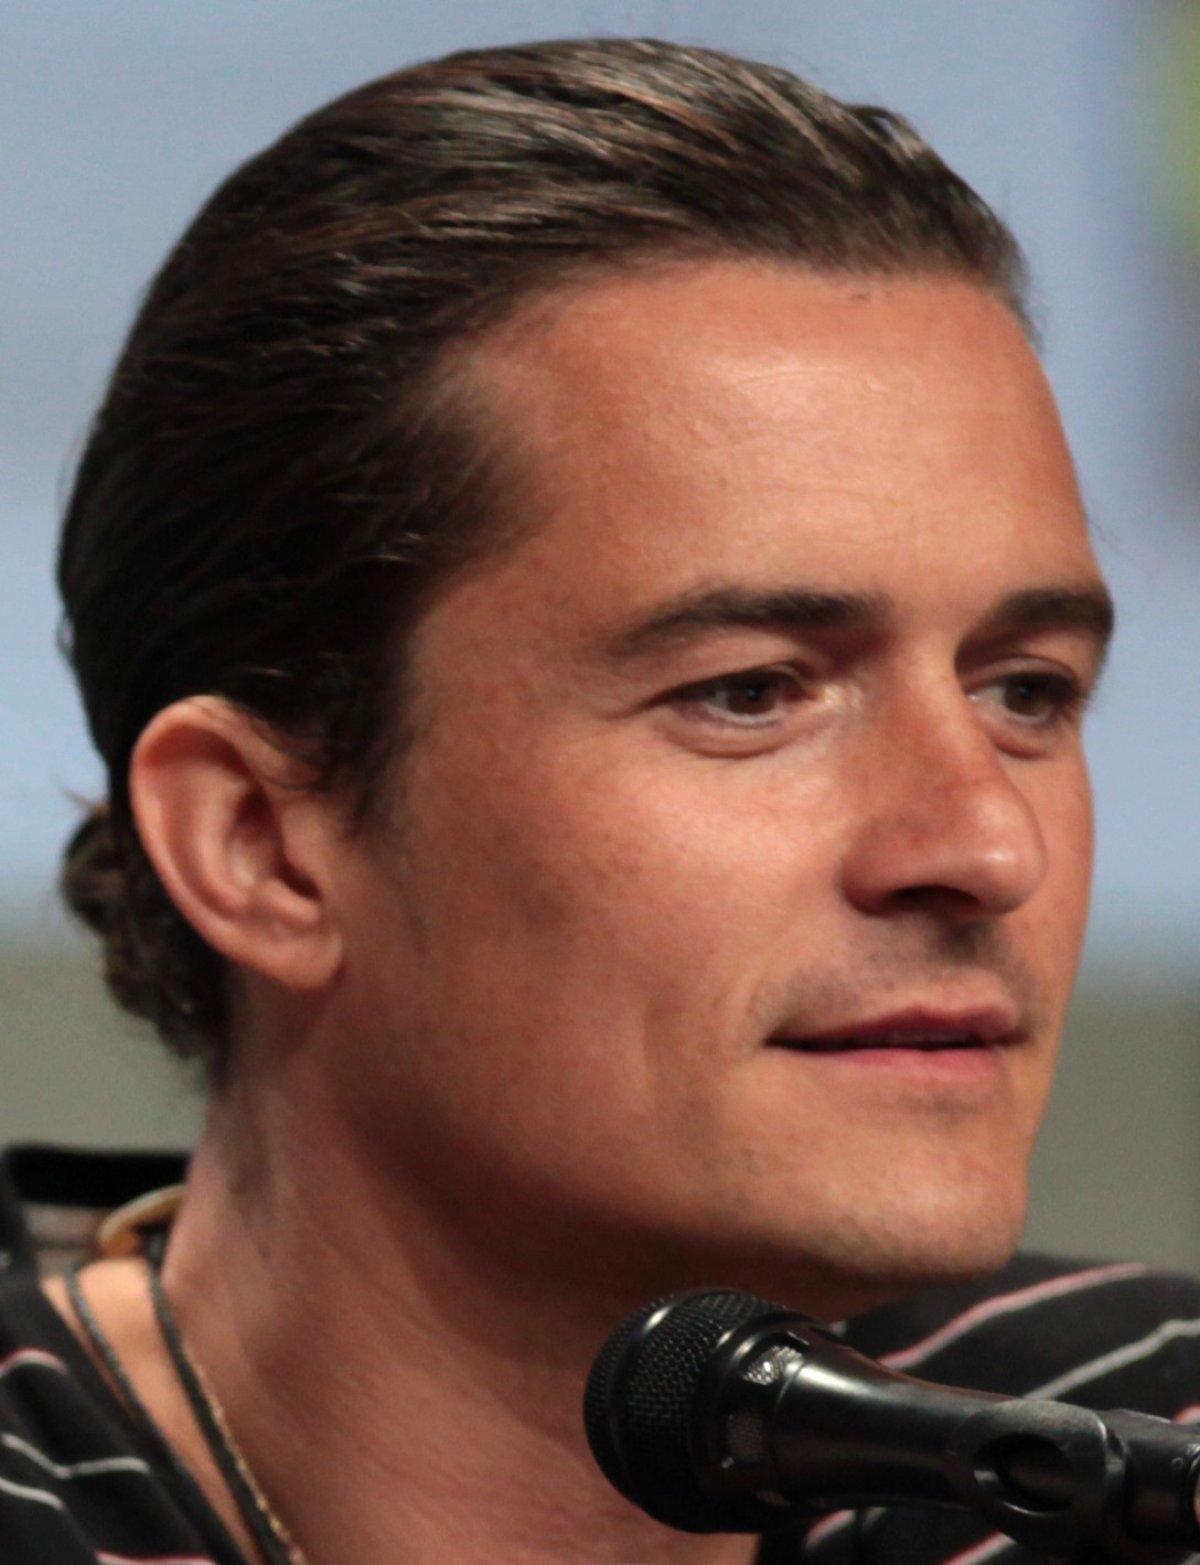 Orlando Bloom rejects David Hasselhoff's 'Knight Rider' film